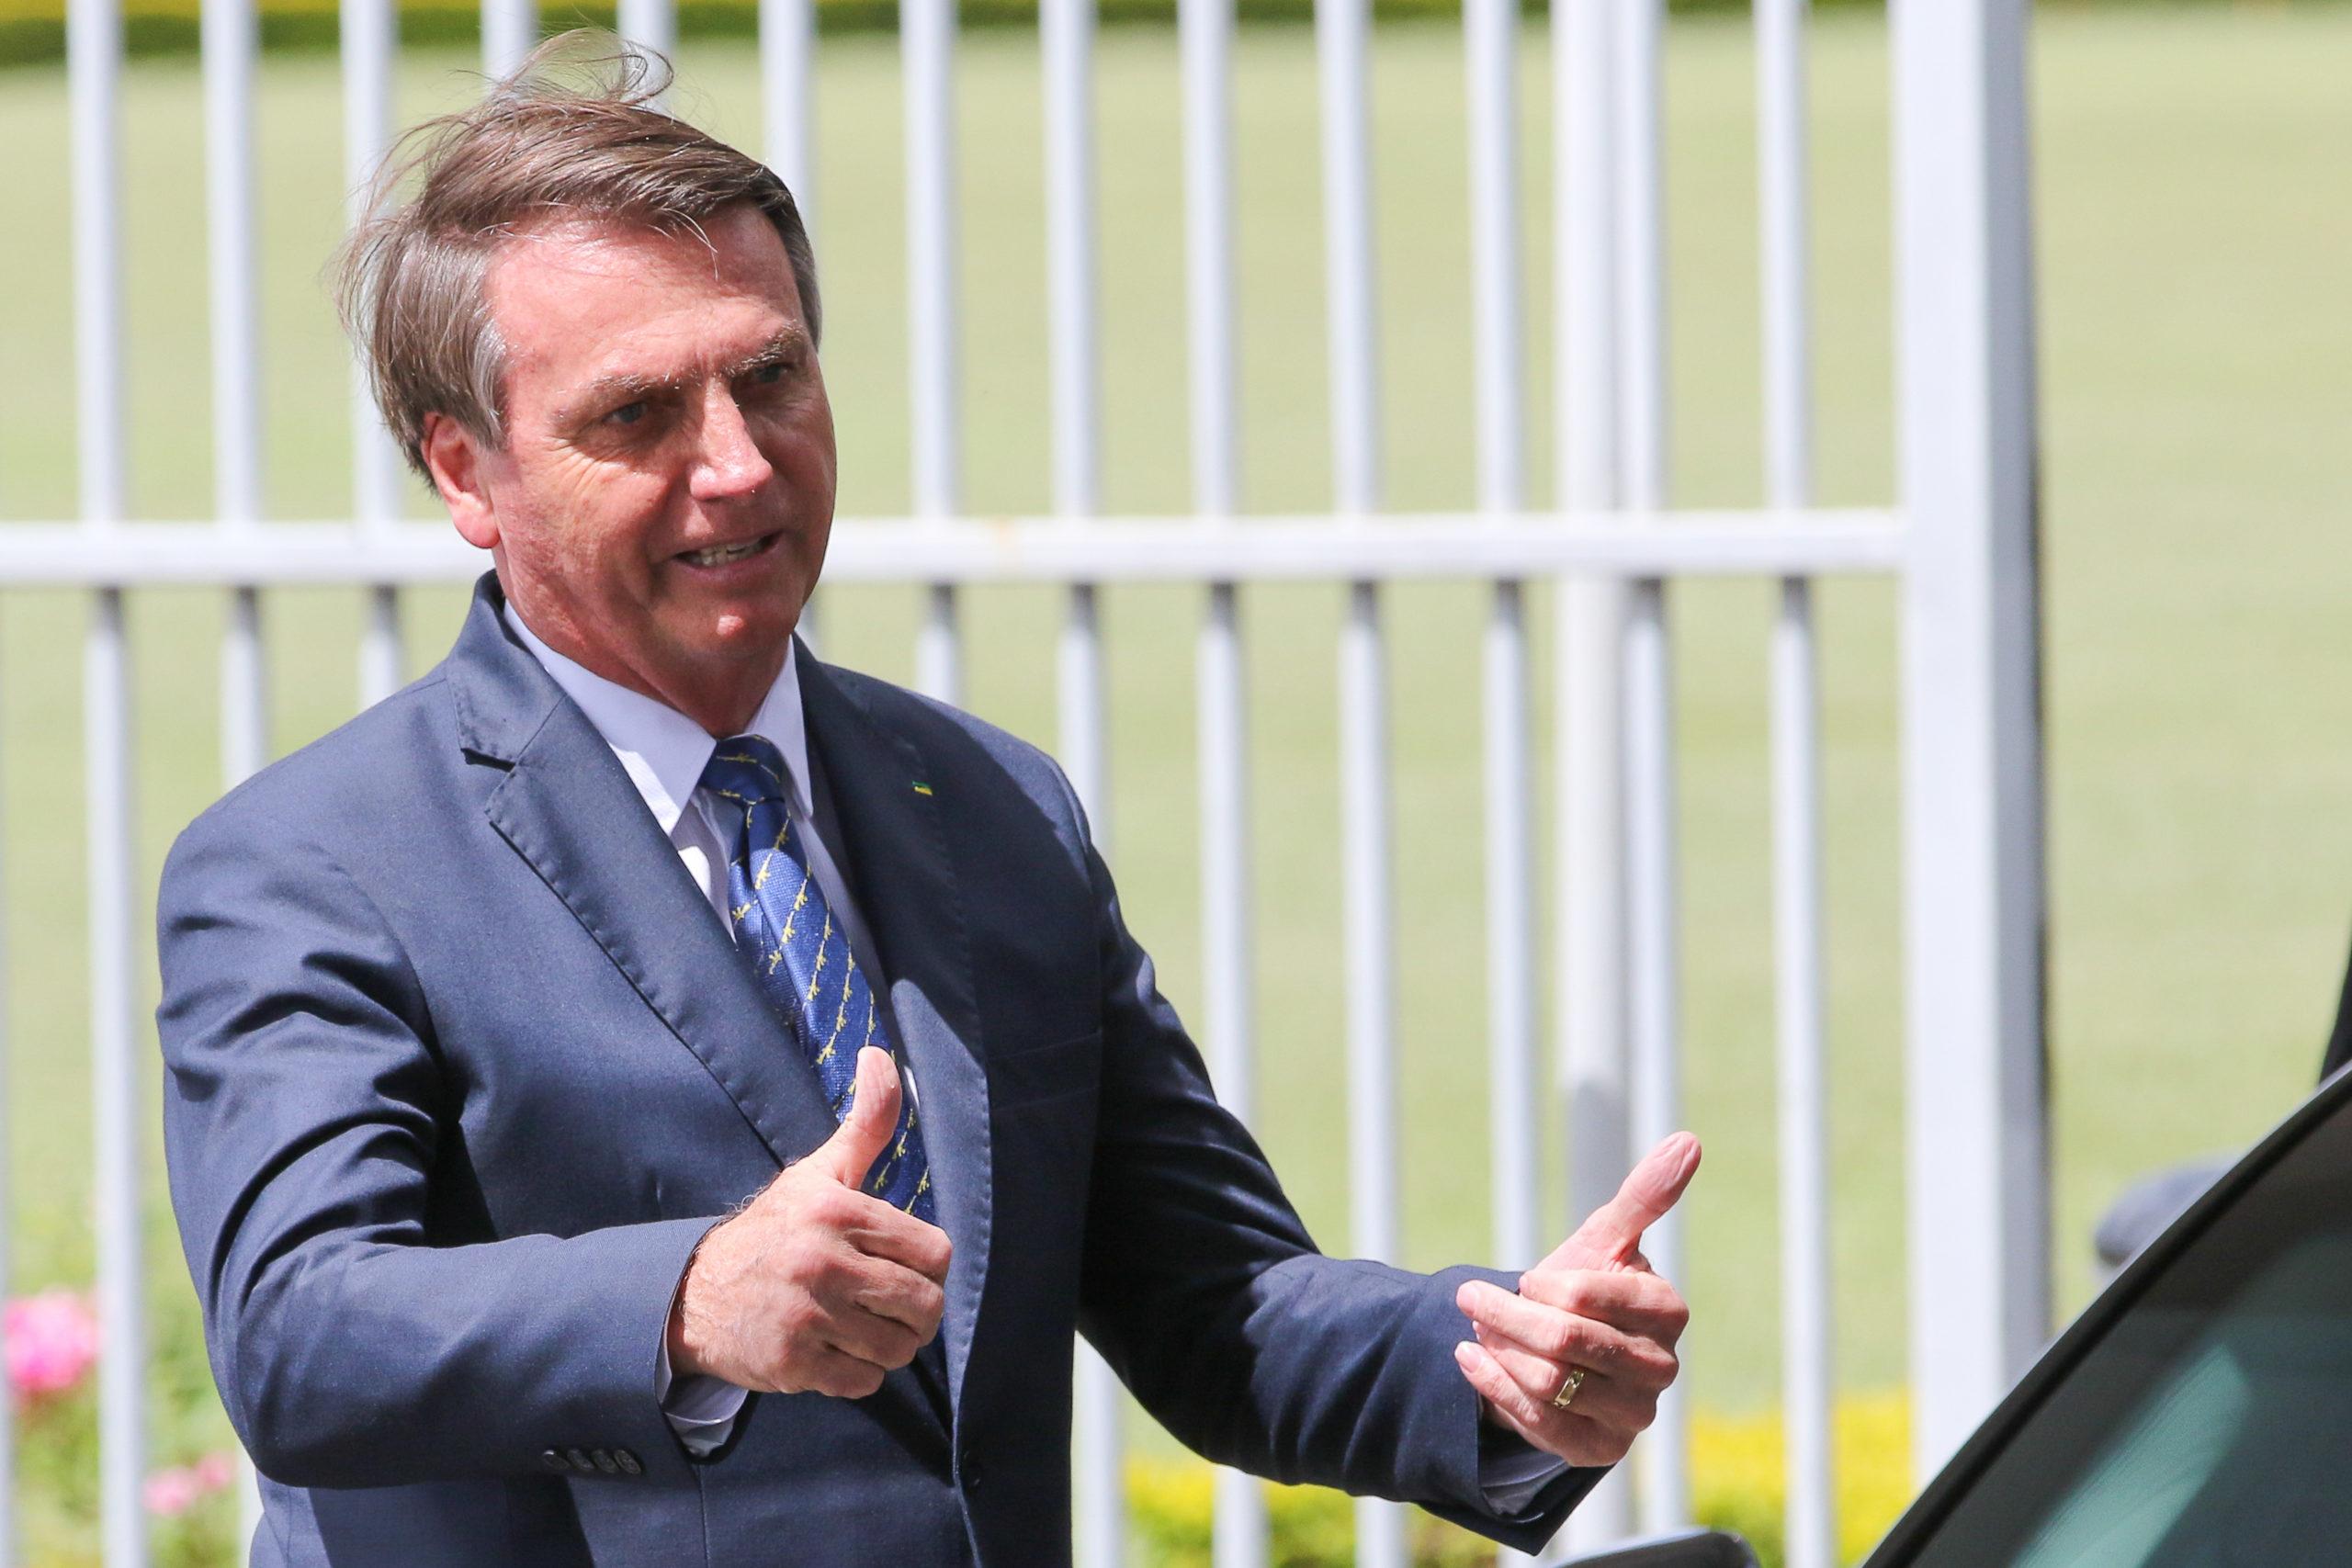 13.03.2020 - Brasília/DF - Jair Bolsonaro cumprimenta populares no Palácio da Alvorada.